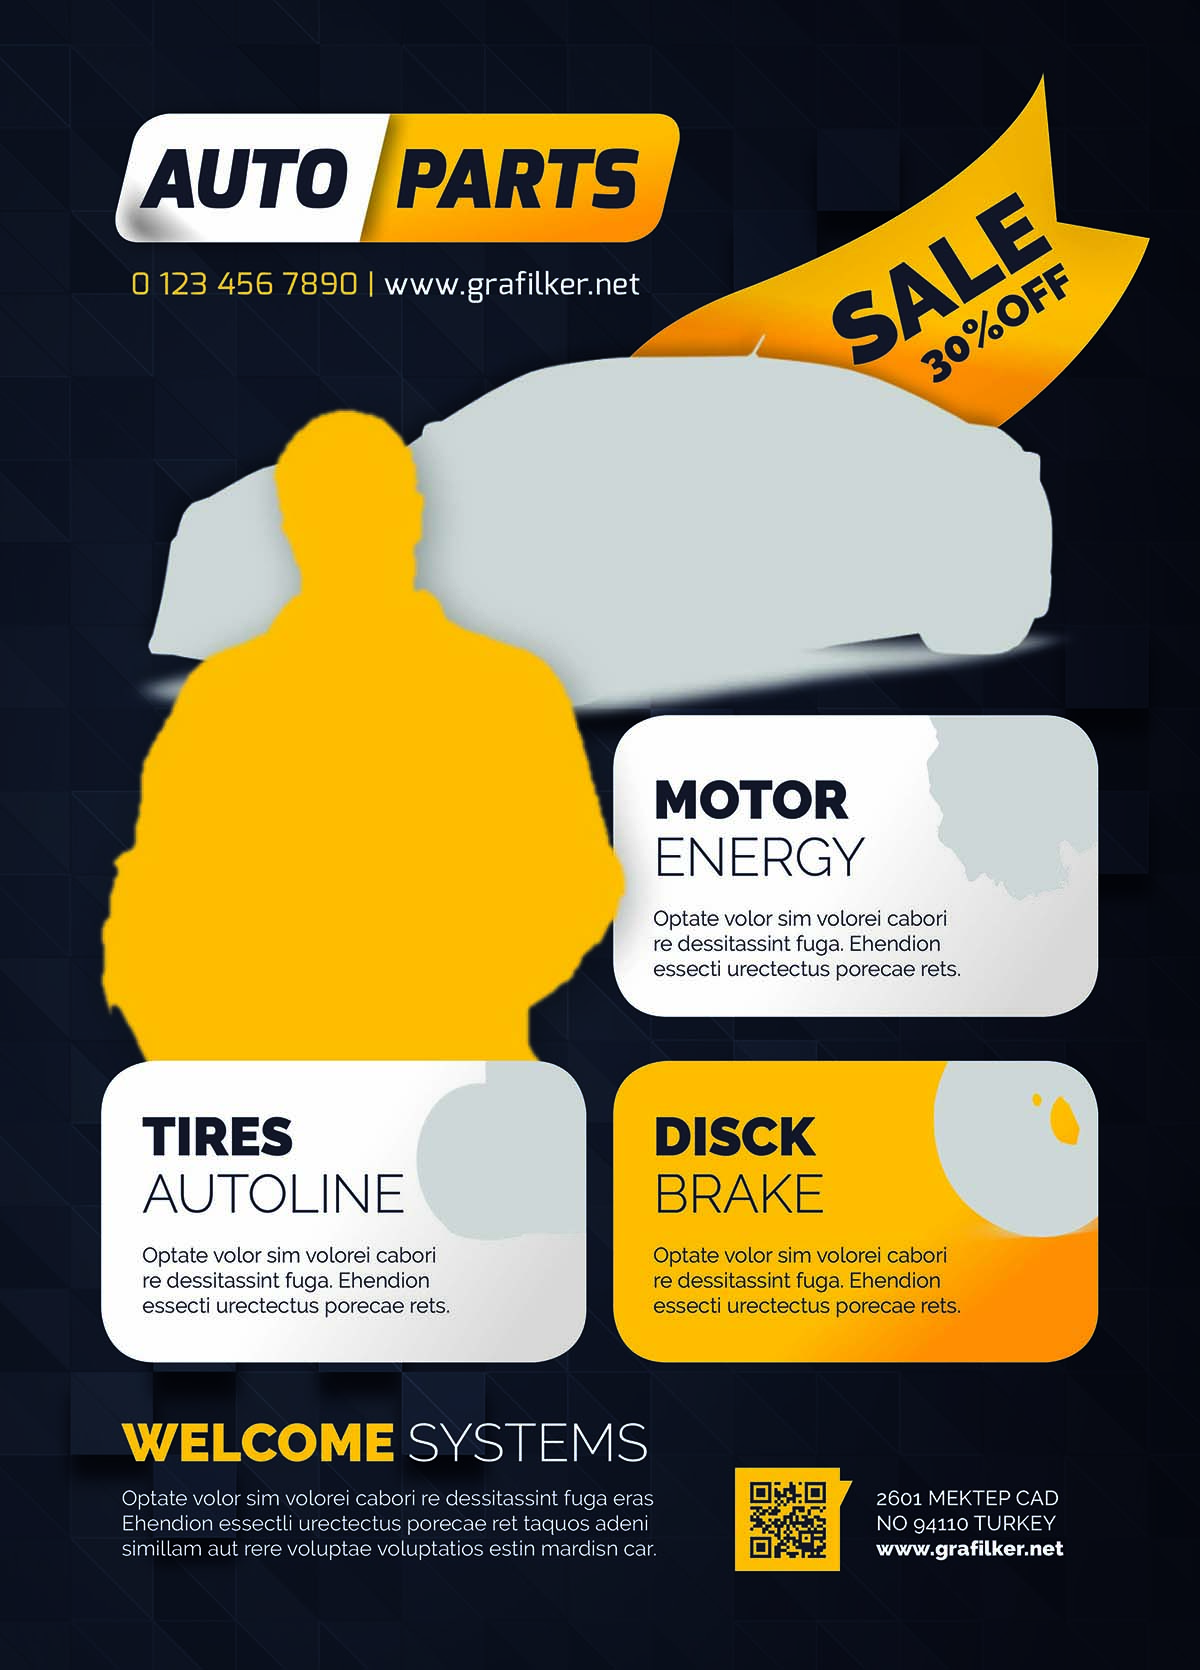 Auto Spare Parts Flyer Design Free Download